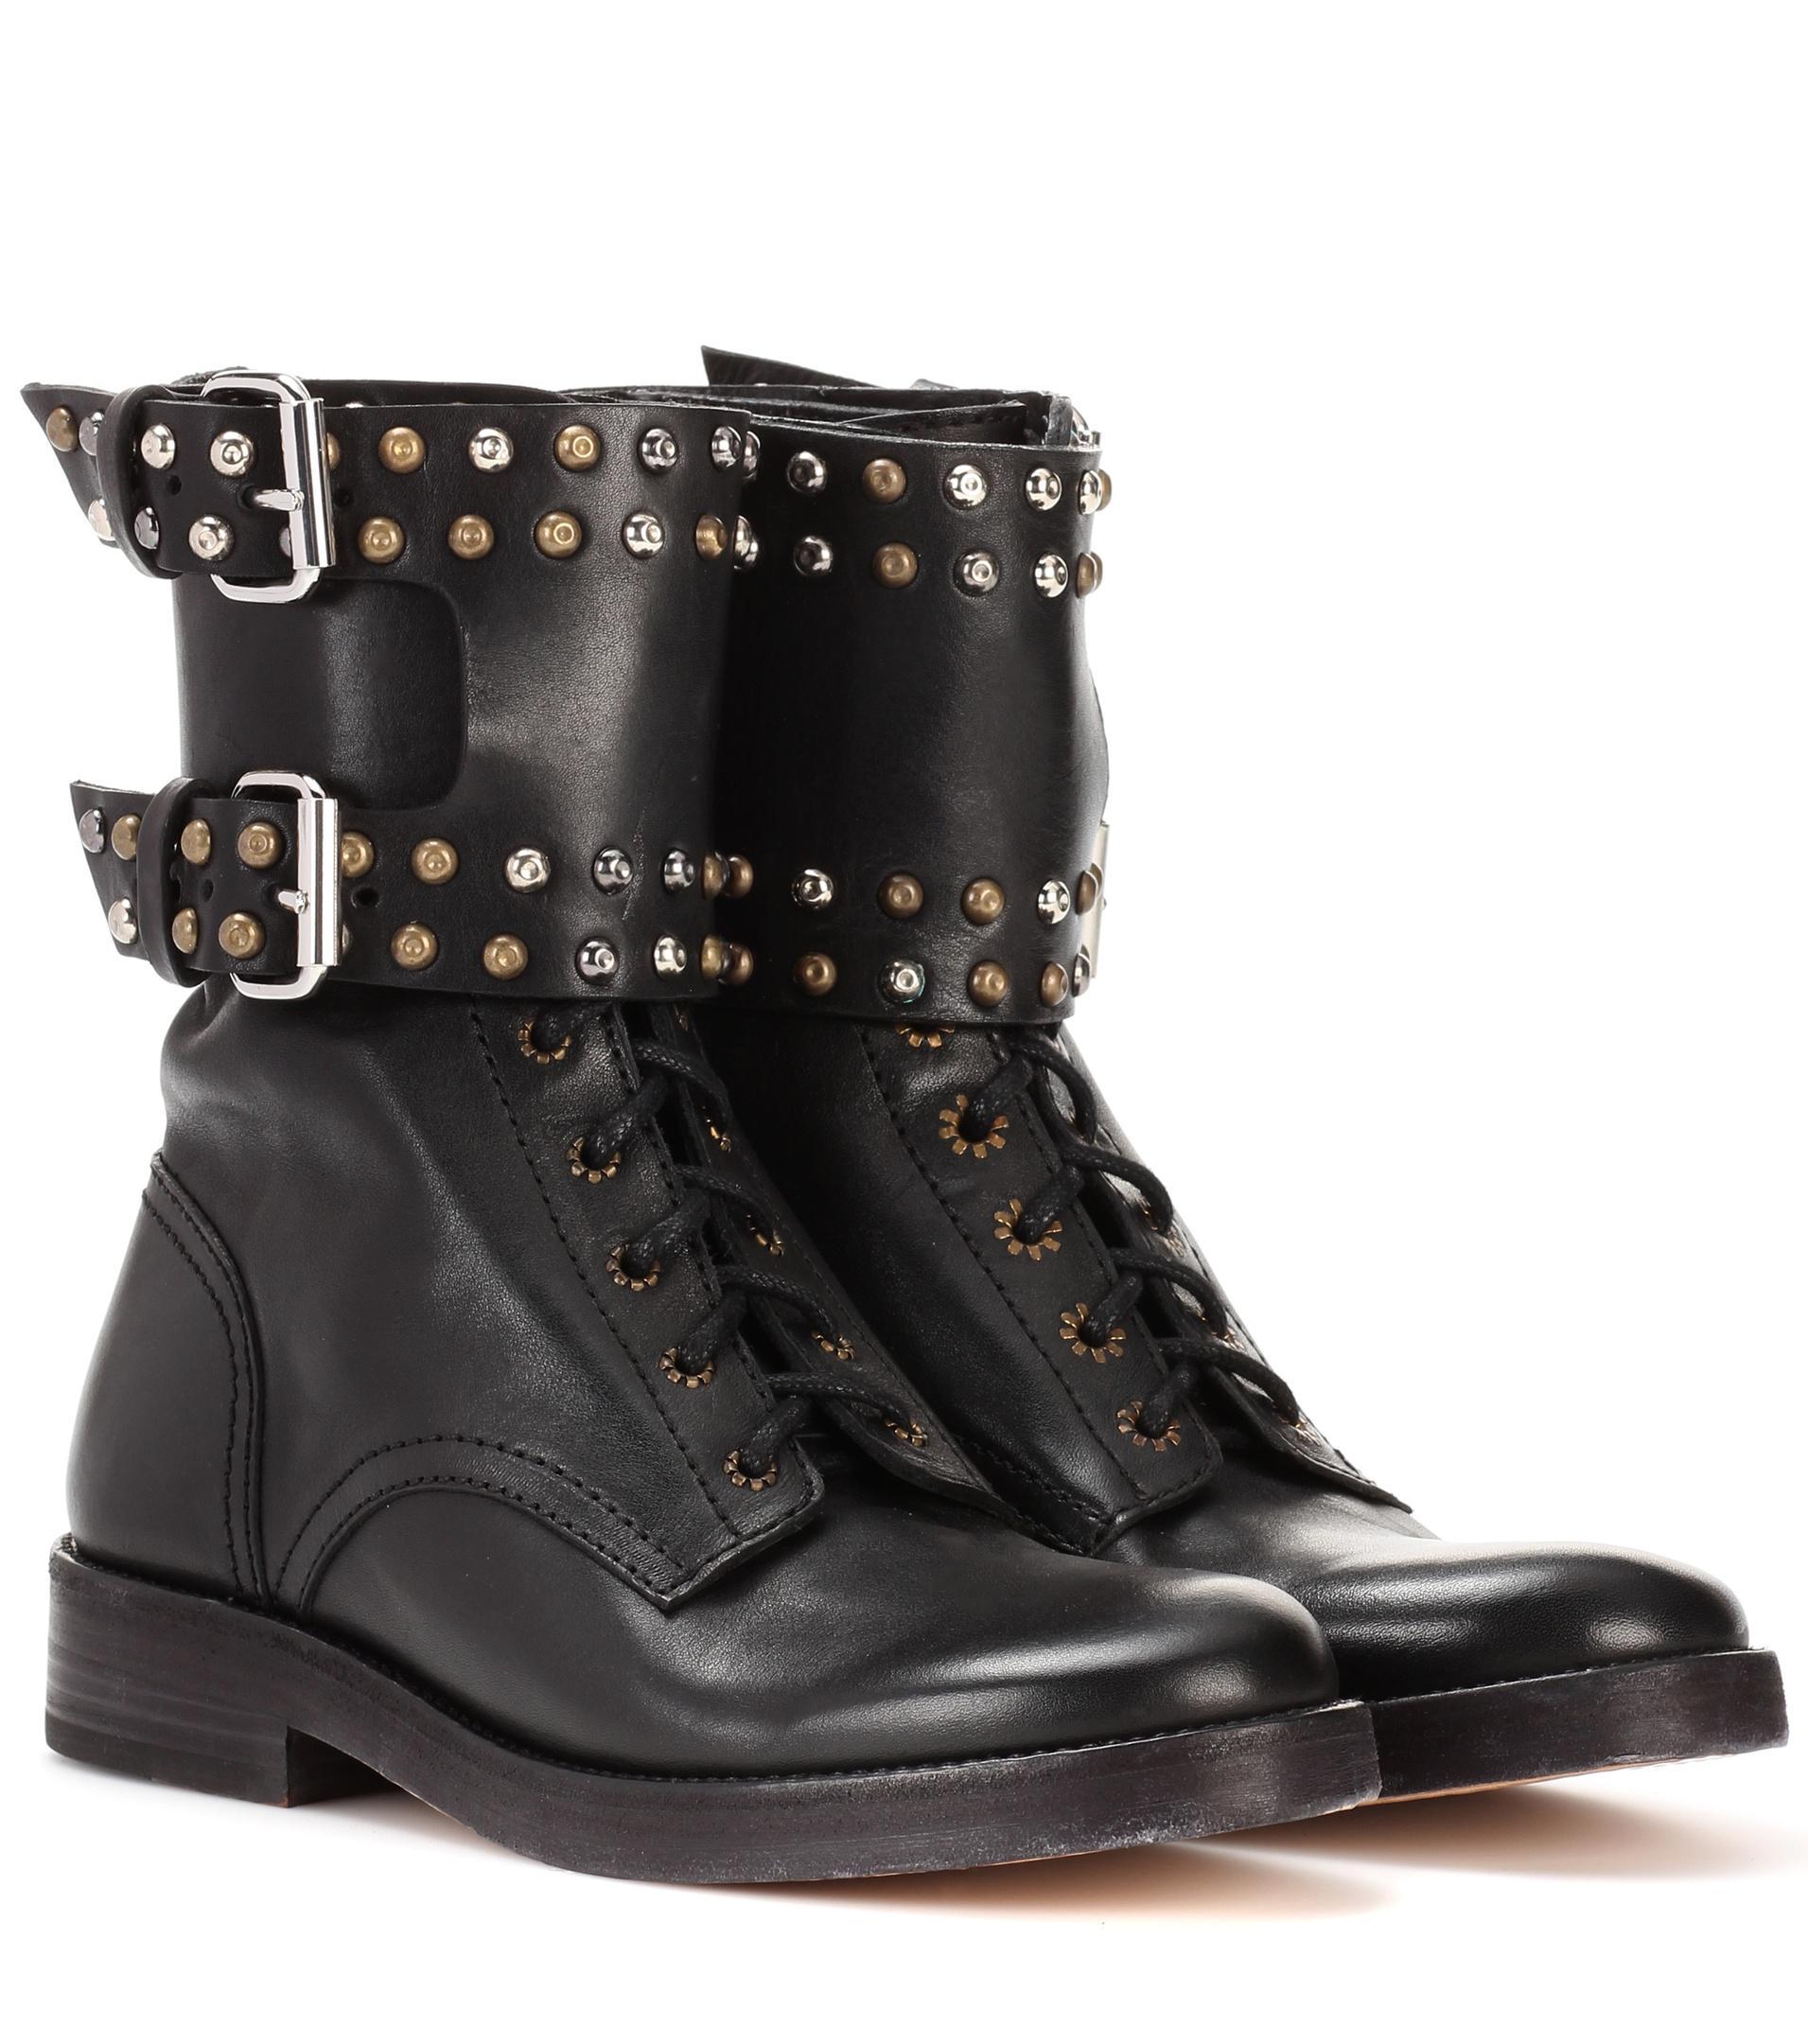 Isabel Marant  Women's Black Teylon Embellished Leather Ankle Boots